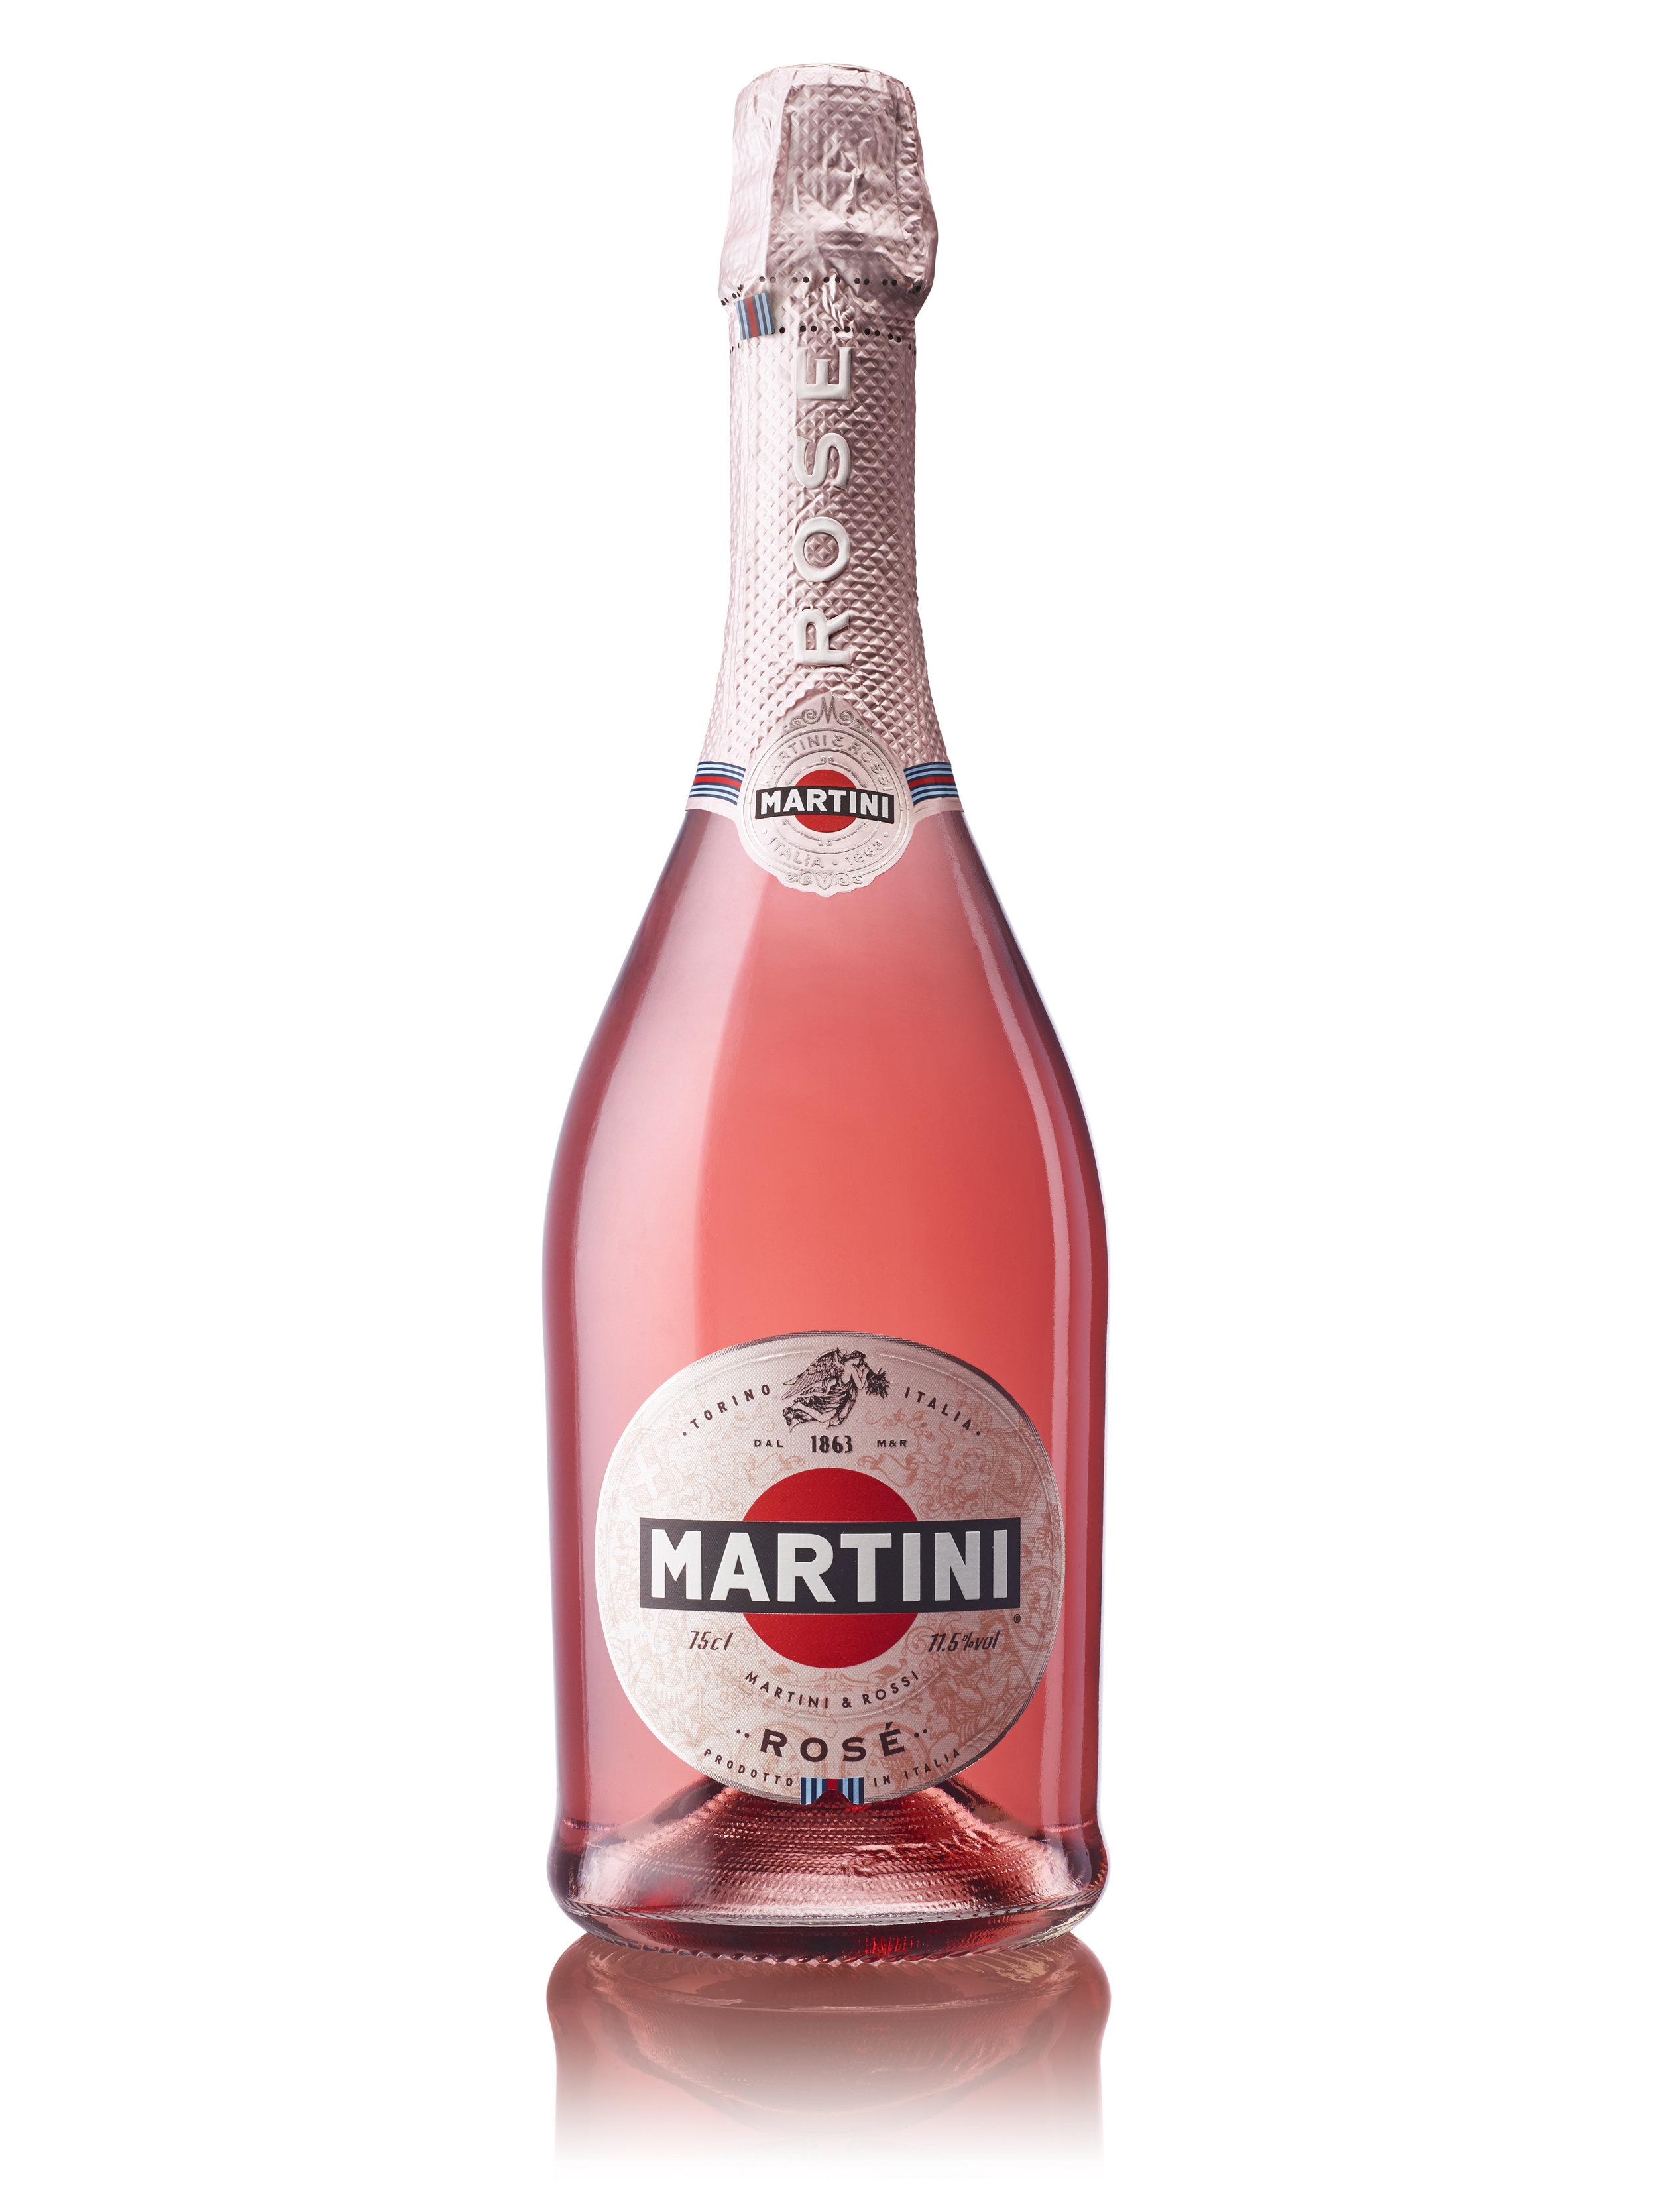 Martini Prosecco Rose.jpg